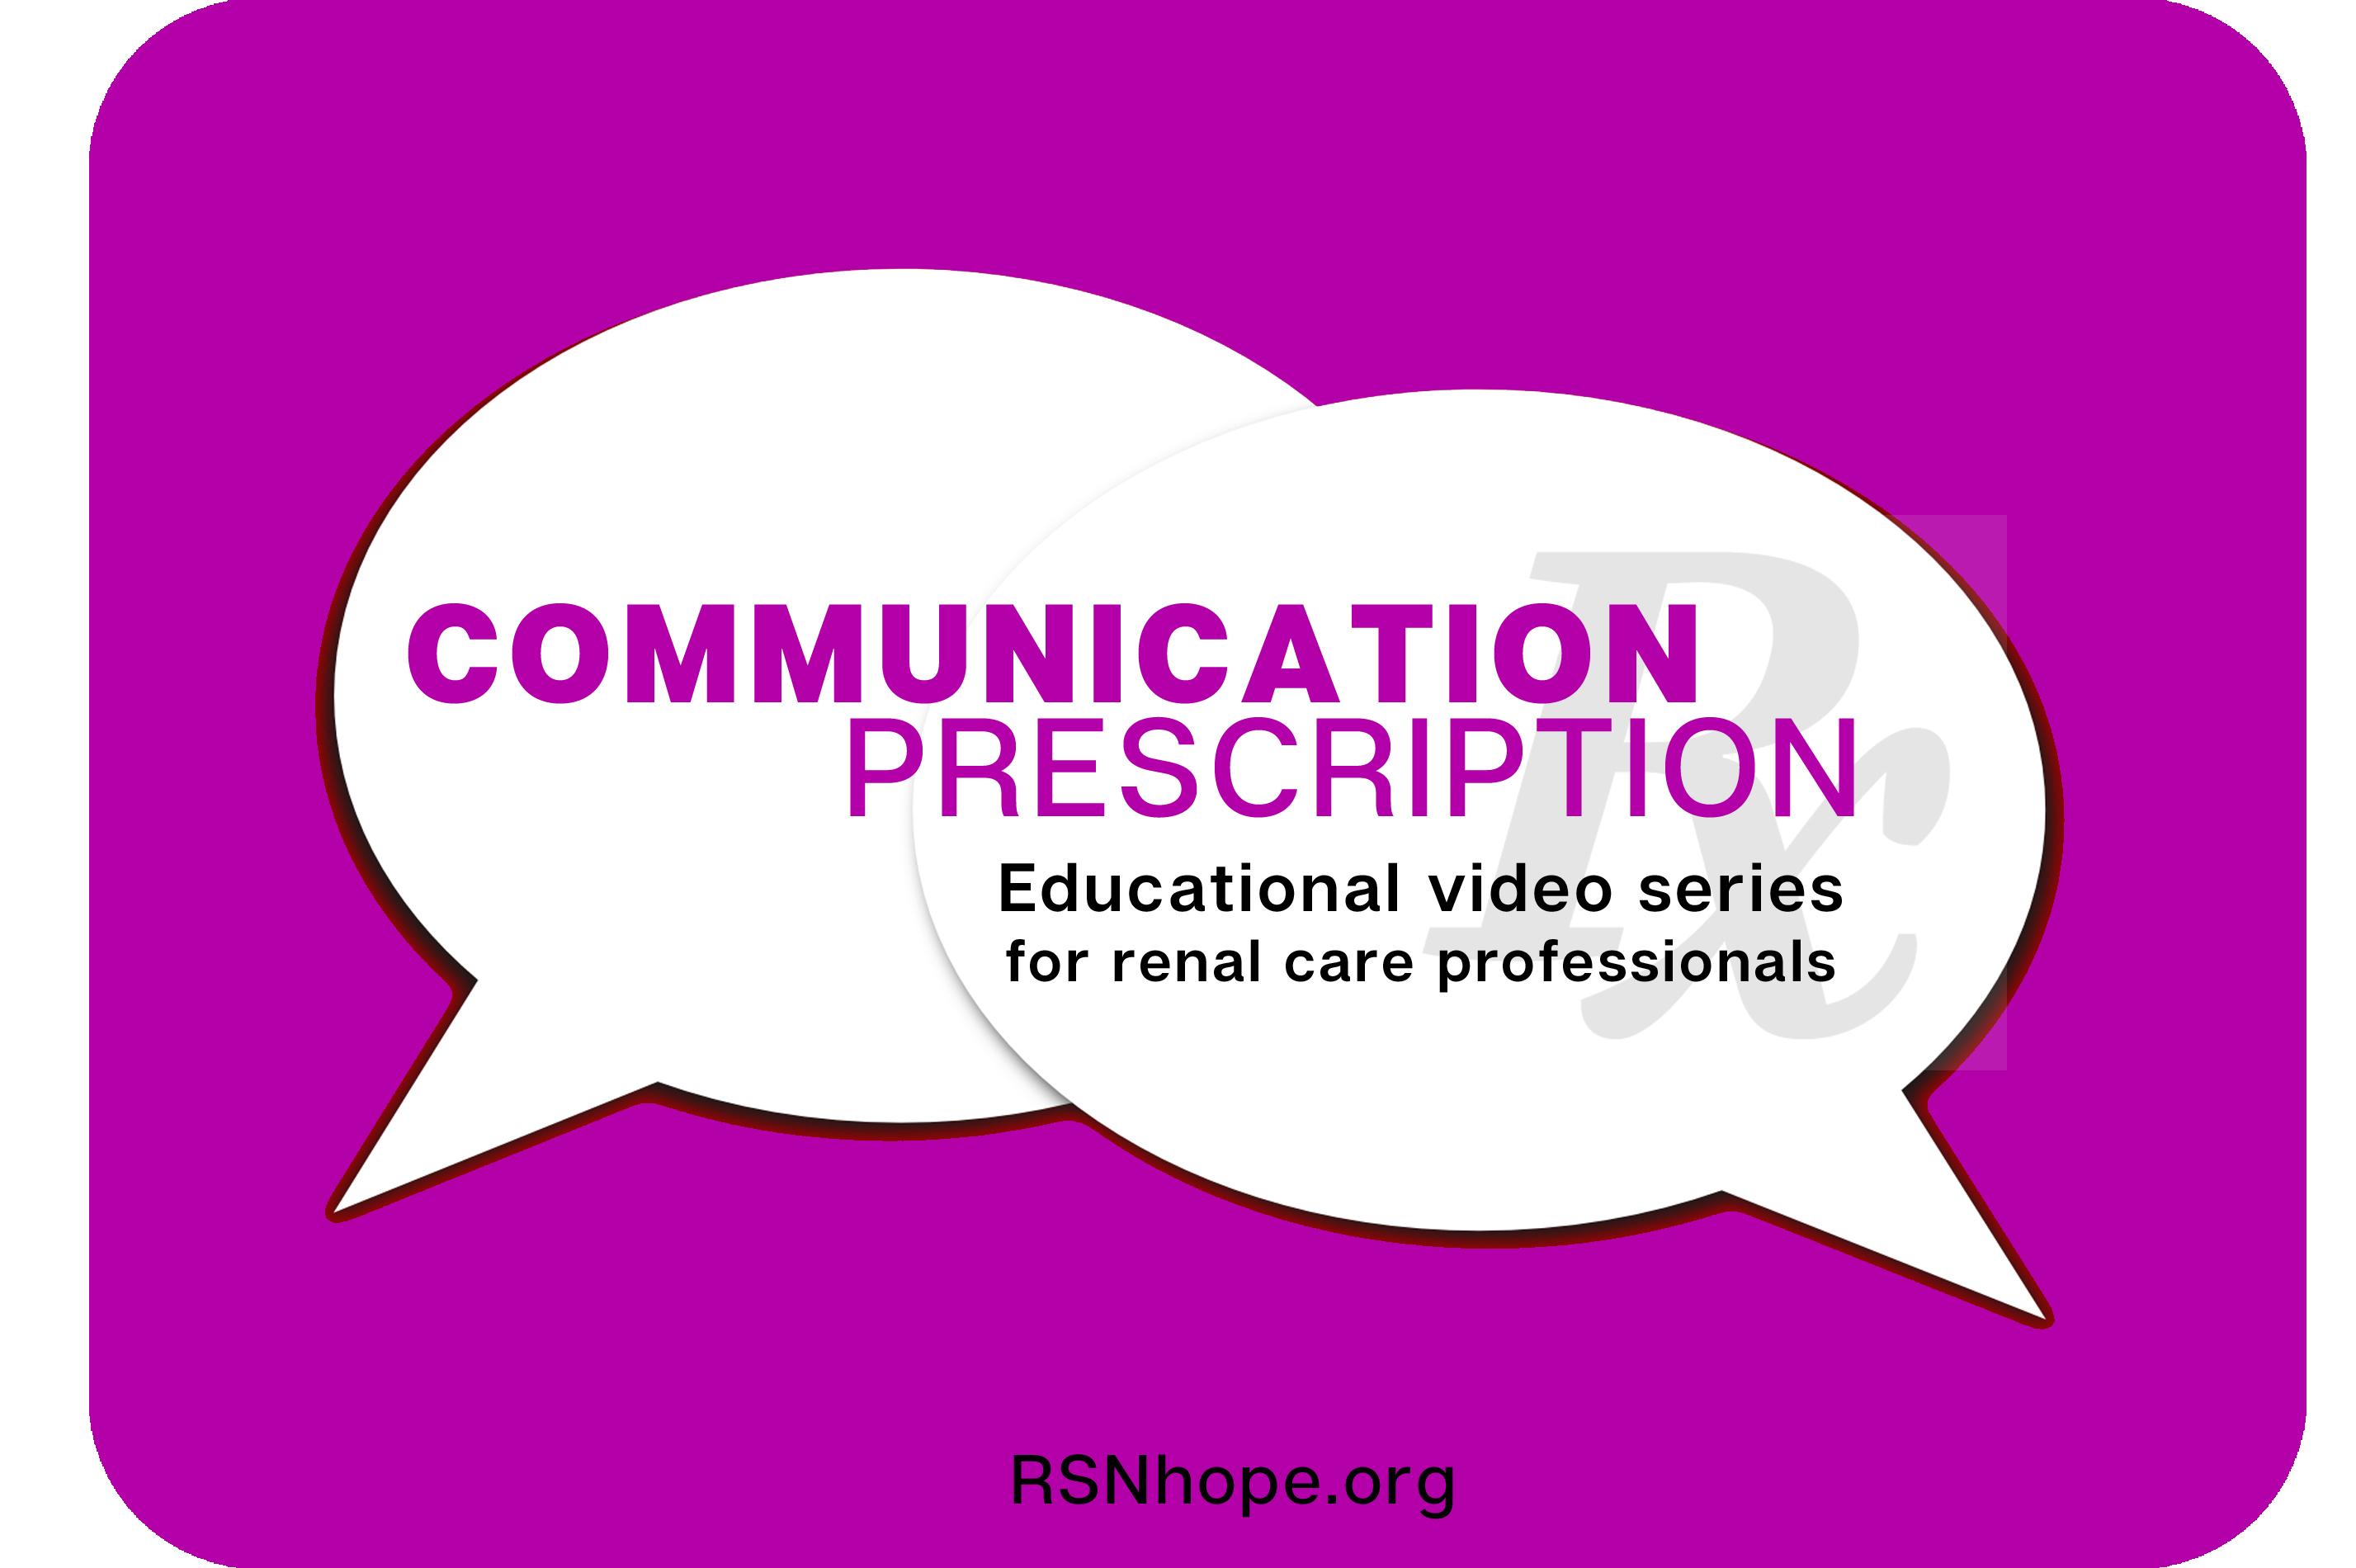 communication prescription-educational videos for healthcare professionals - kidney disease - lori hartwell